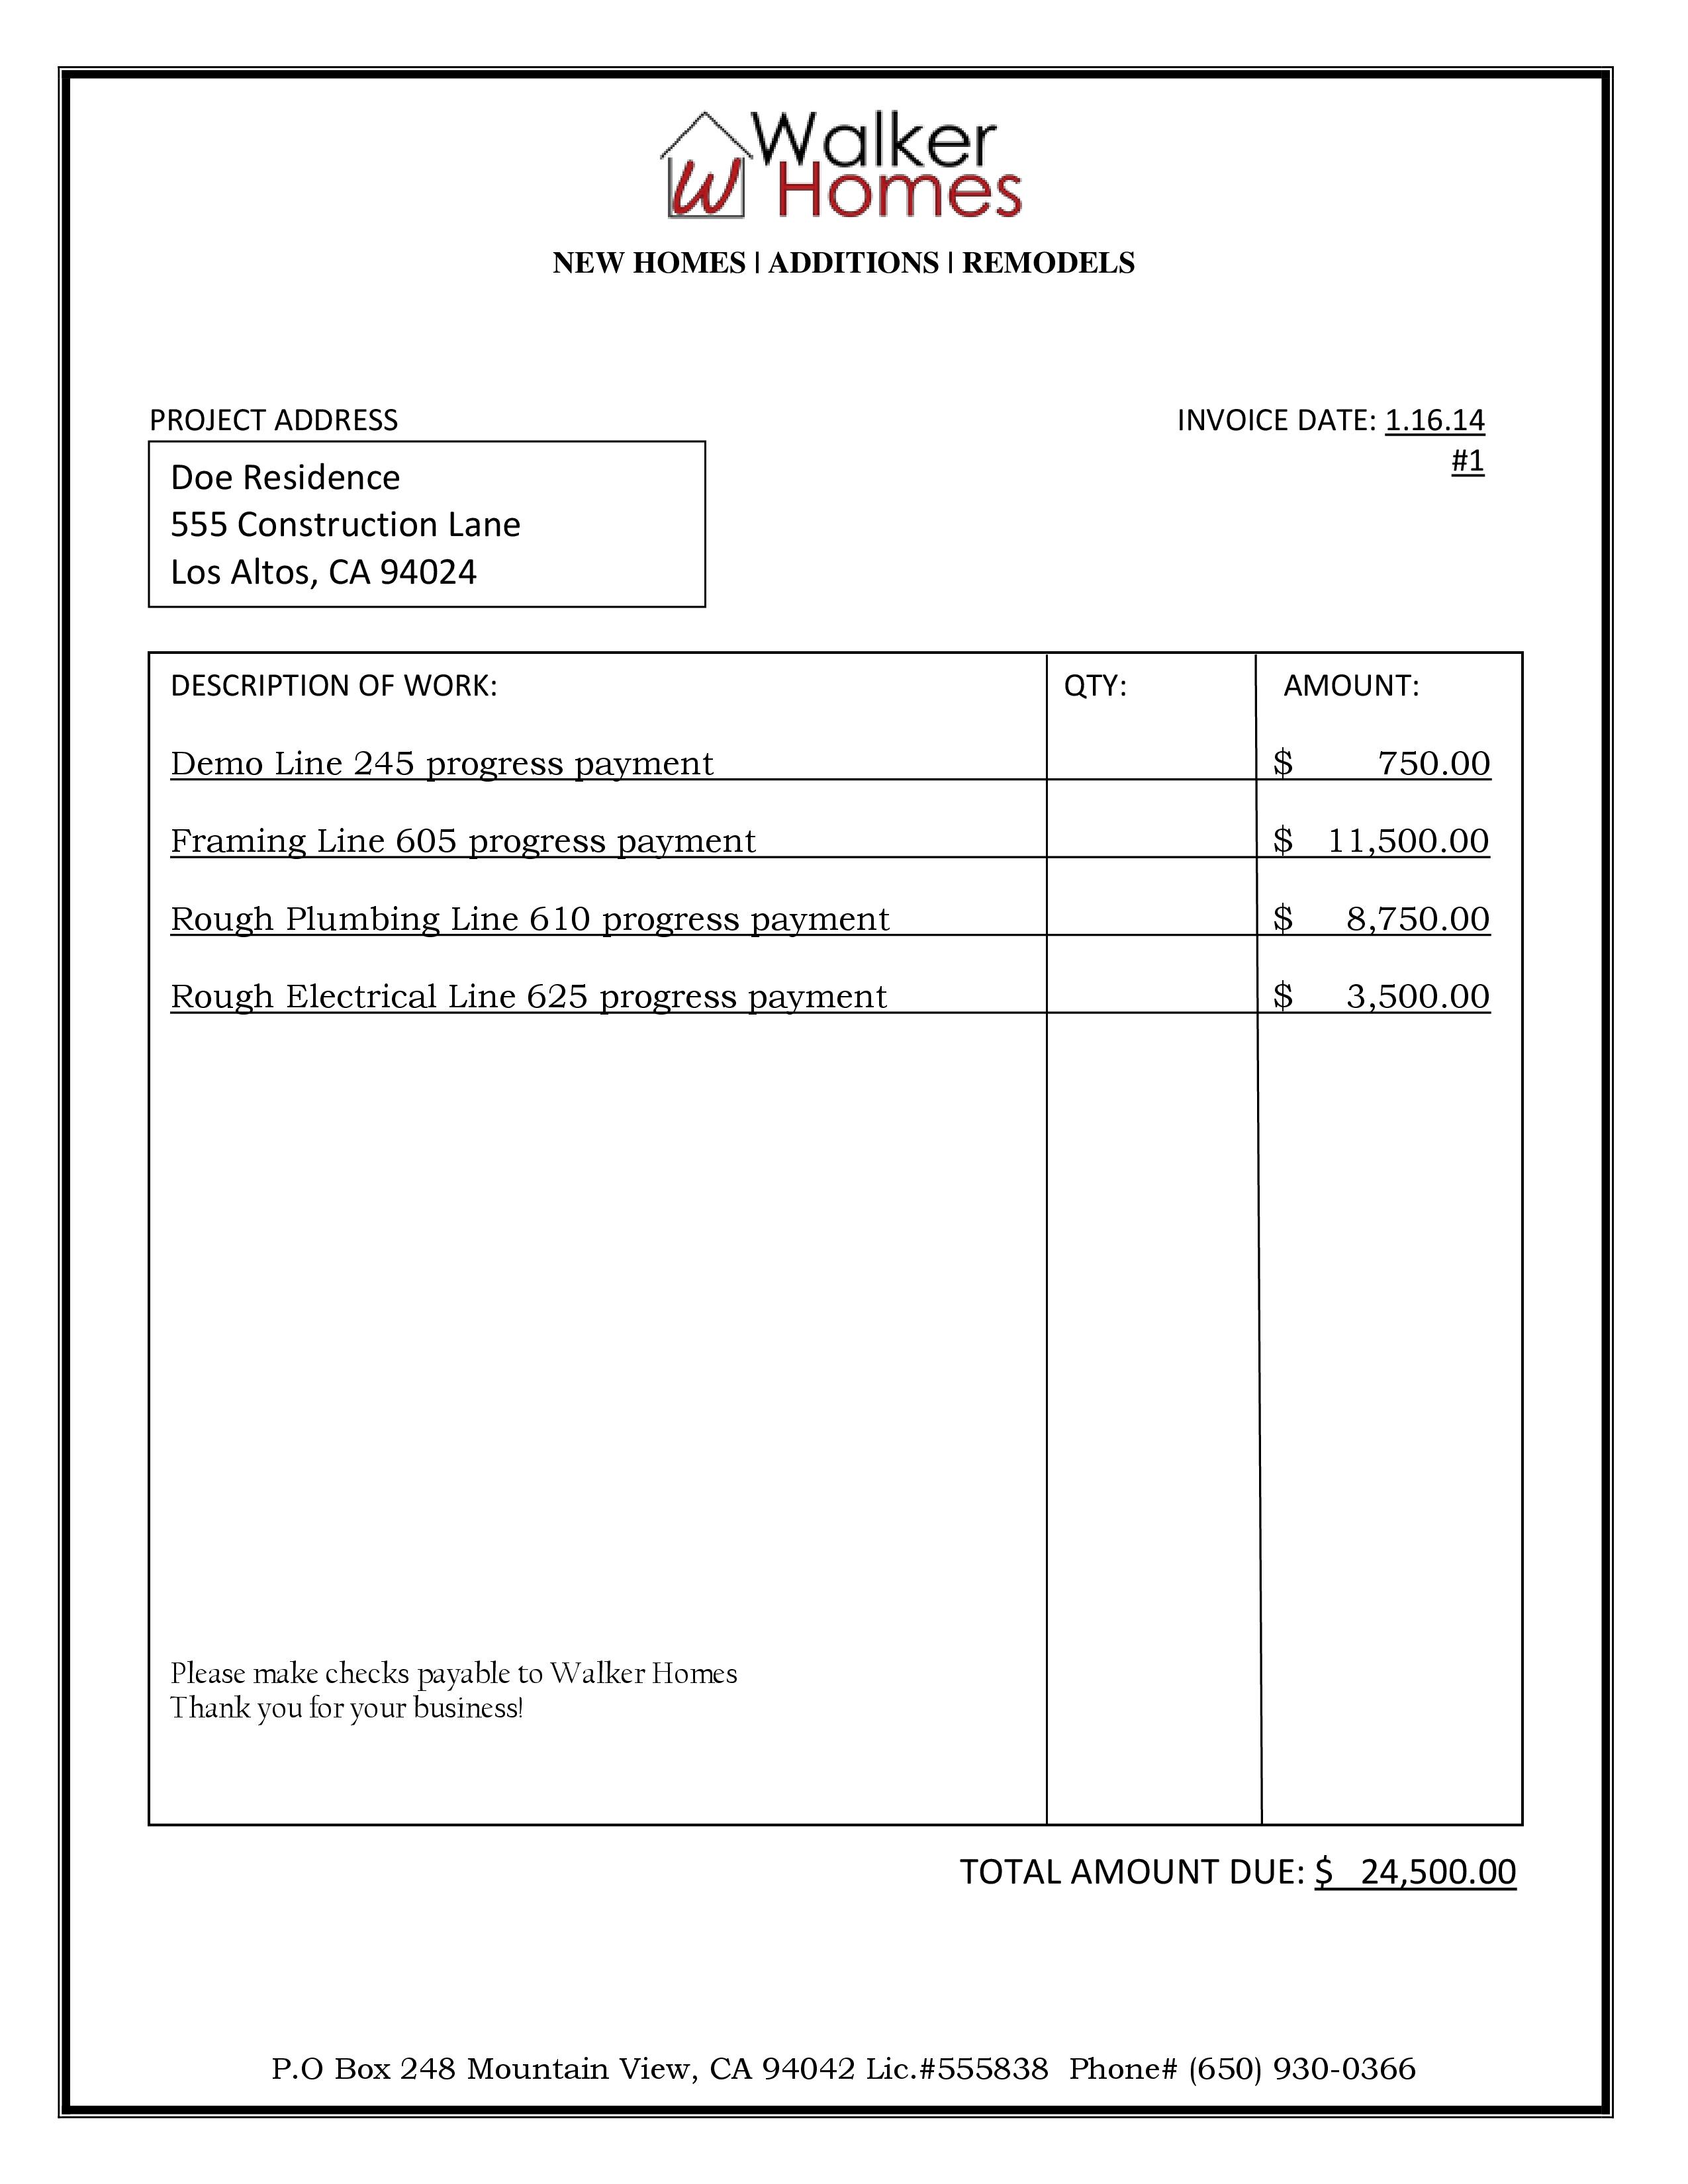 sample bid amp billing walker homes construction invoice samples